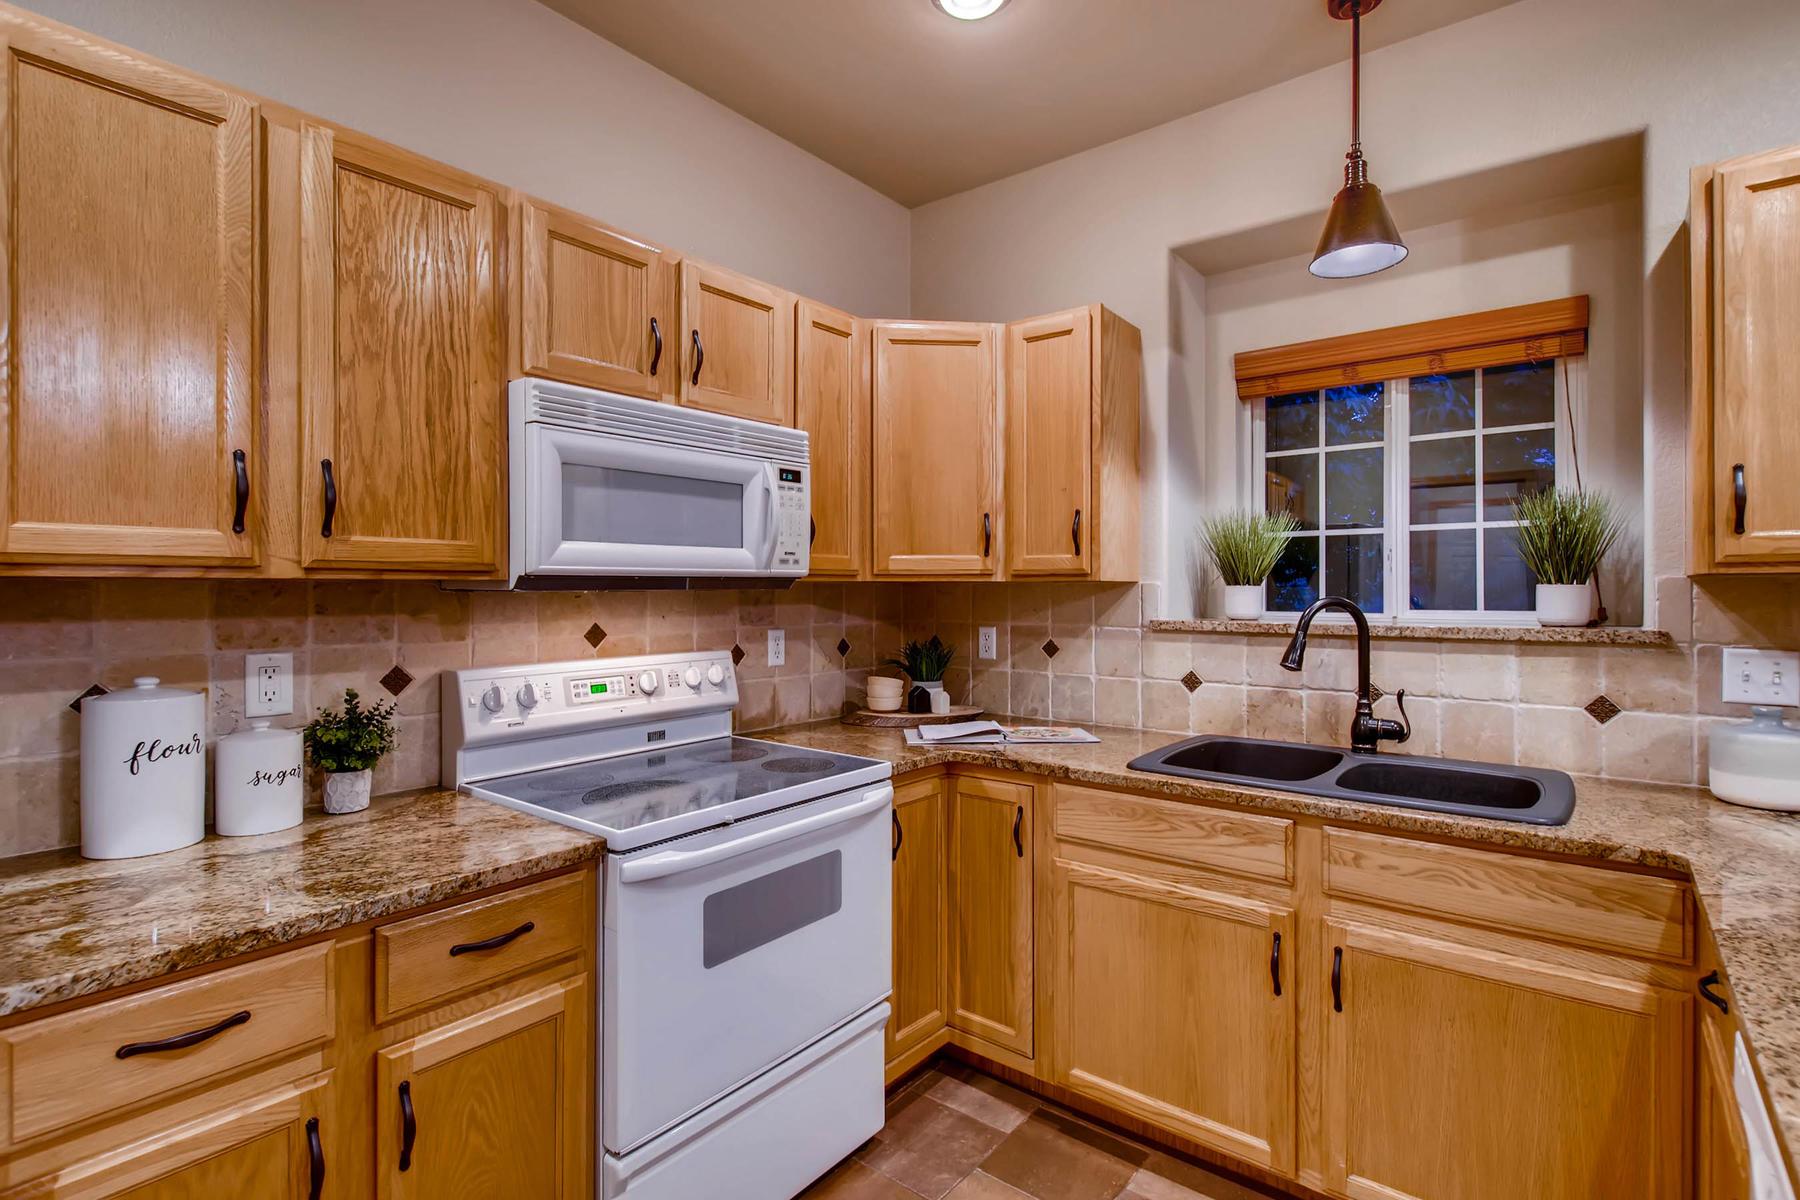 1694 Seven Lakes Dr Loveland-MLS_Size-014-20-Kitchen-1800x1200-72dpi.jpg